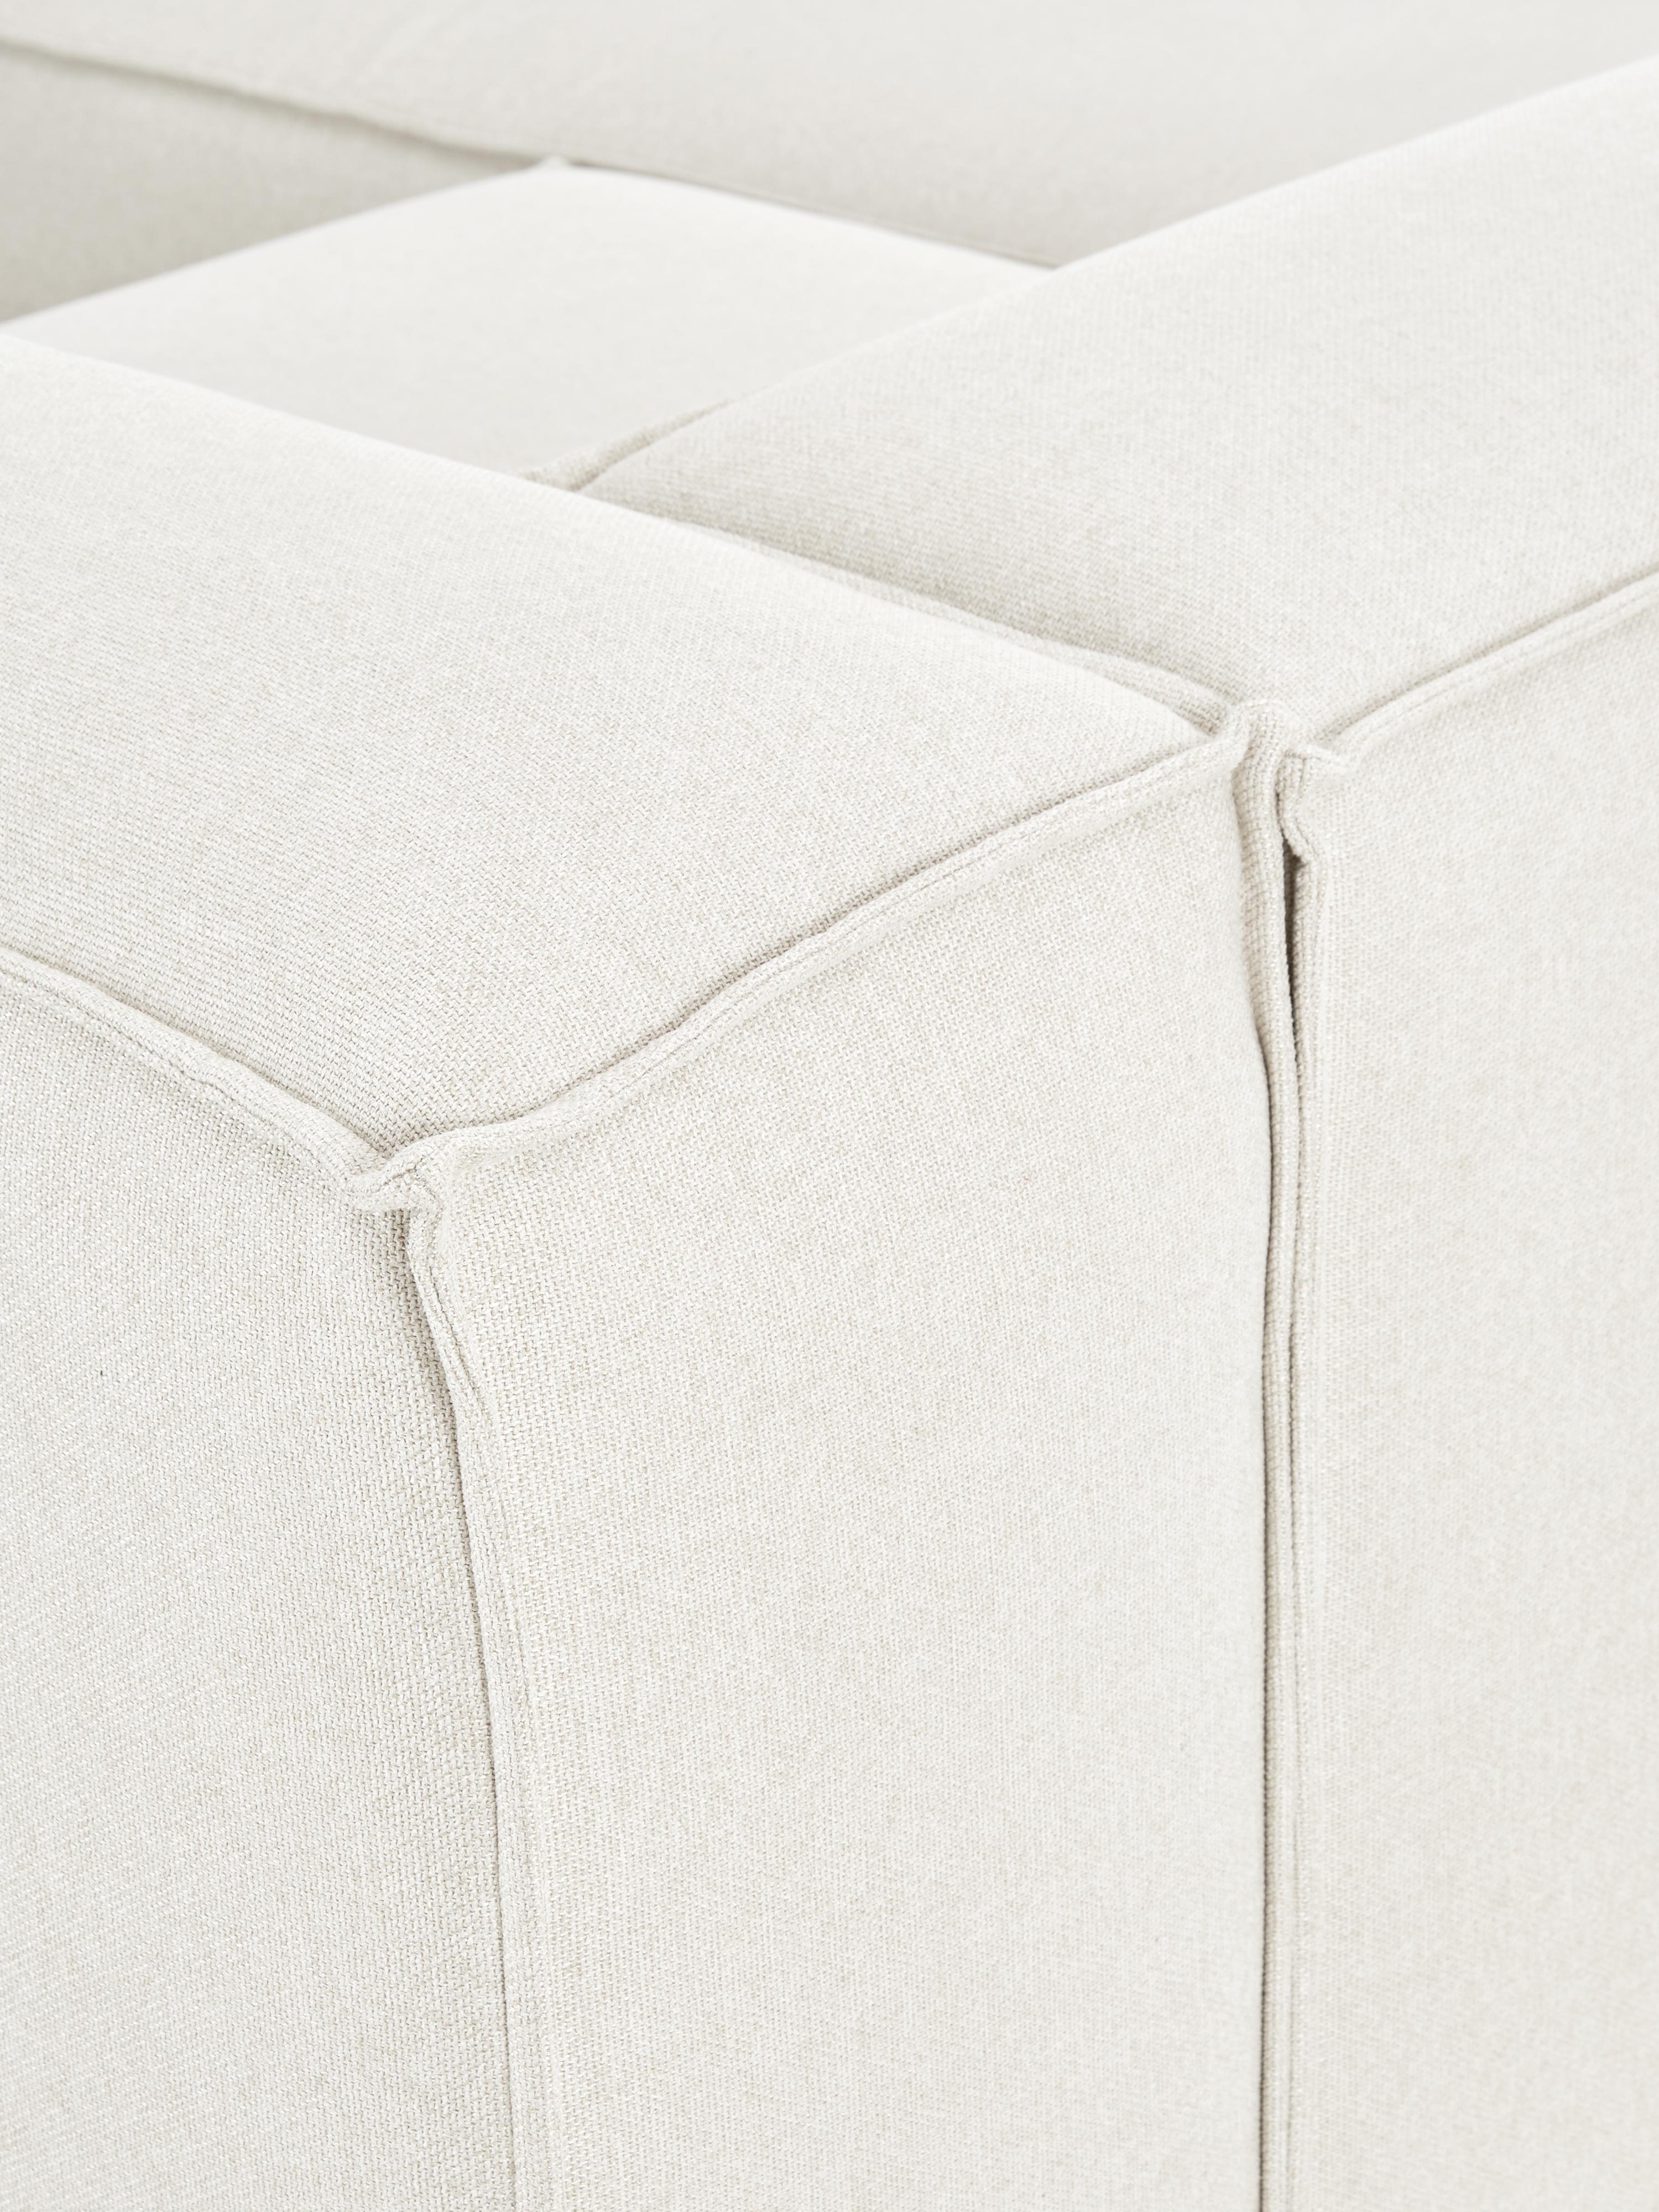 Canapé d'angle modulable dossier bas Lennon, Tissu beige